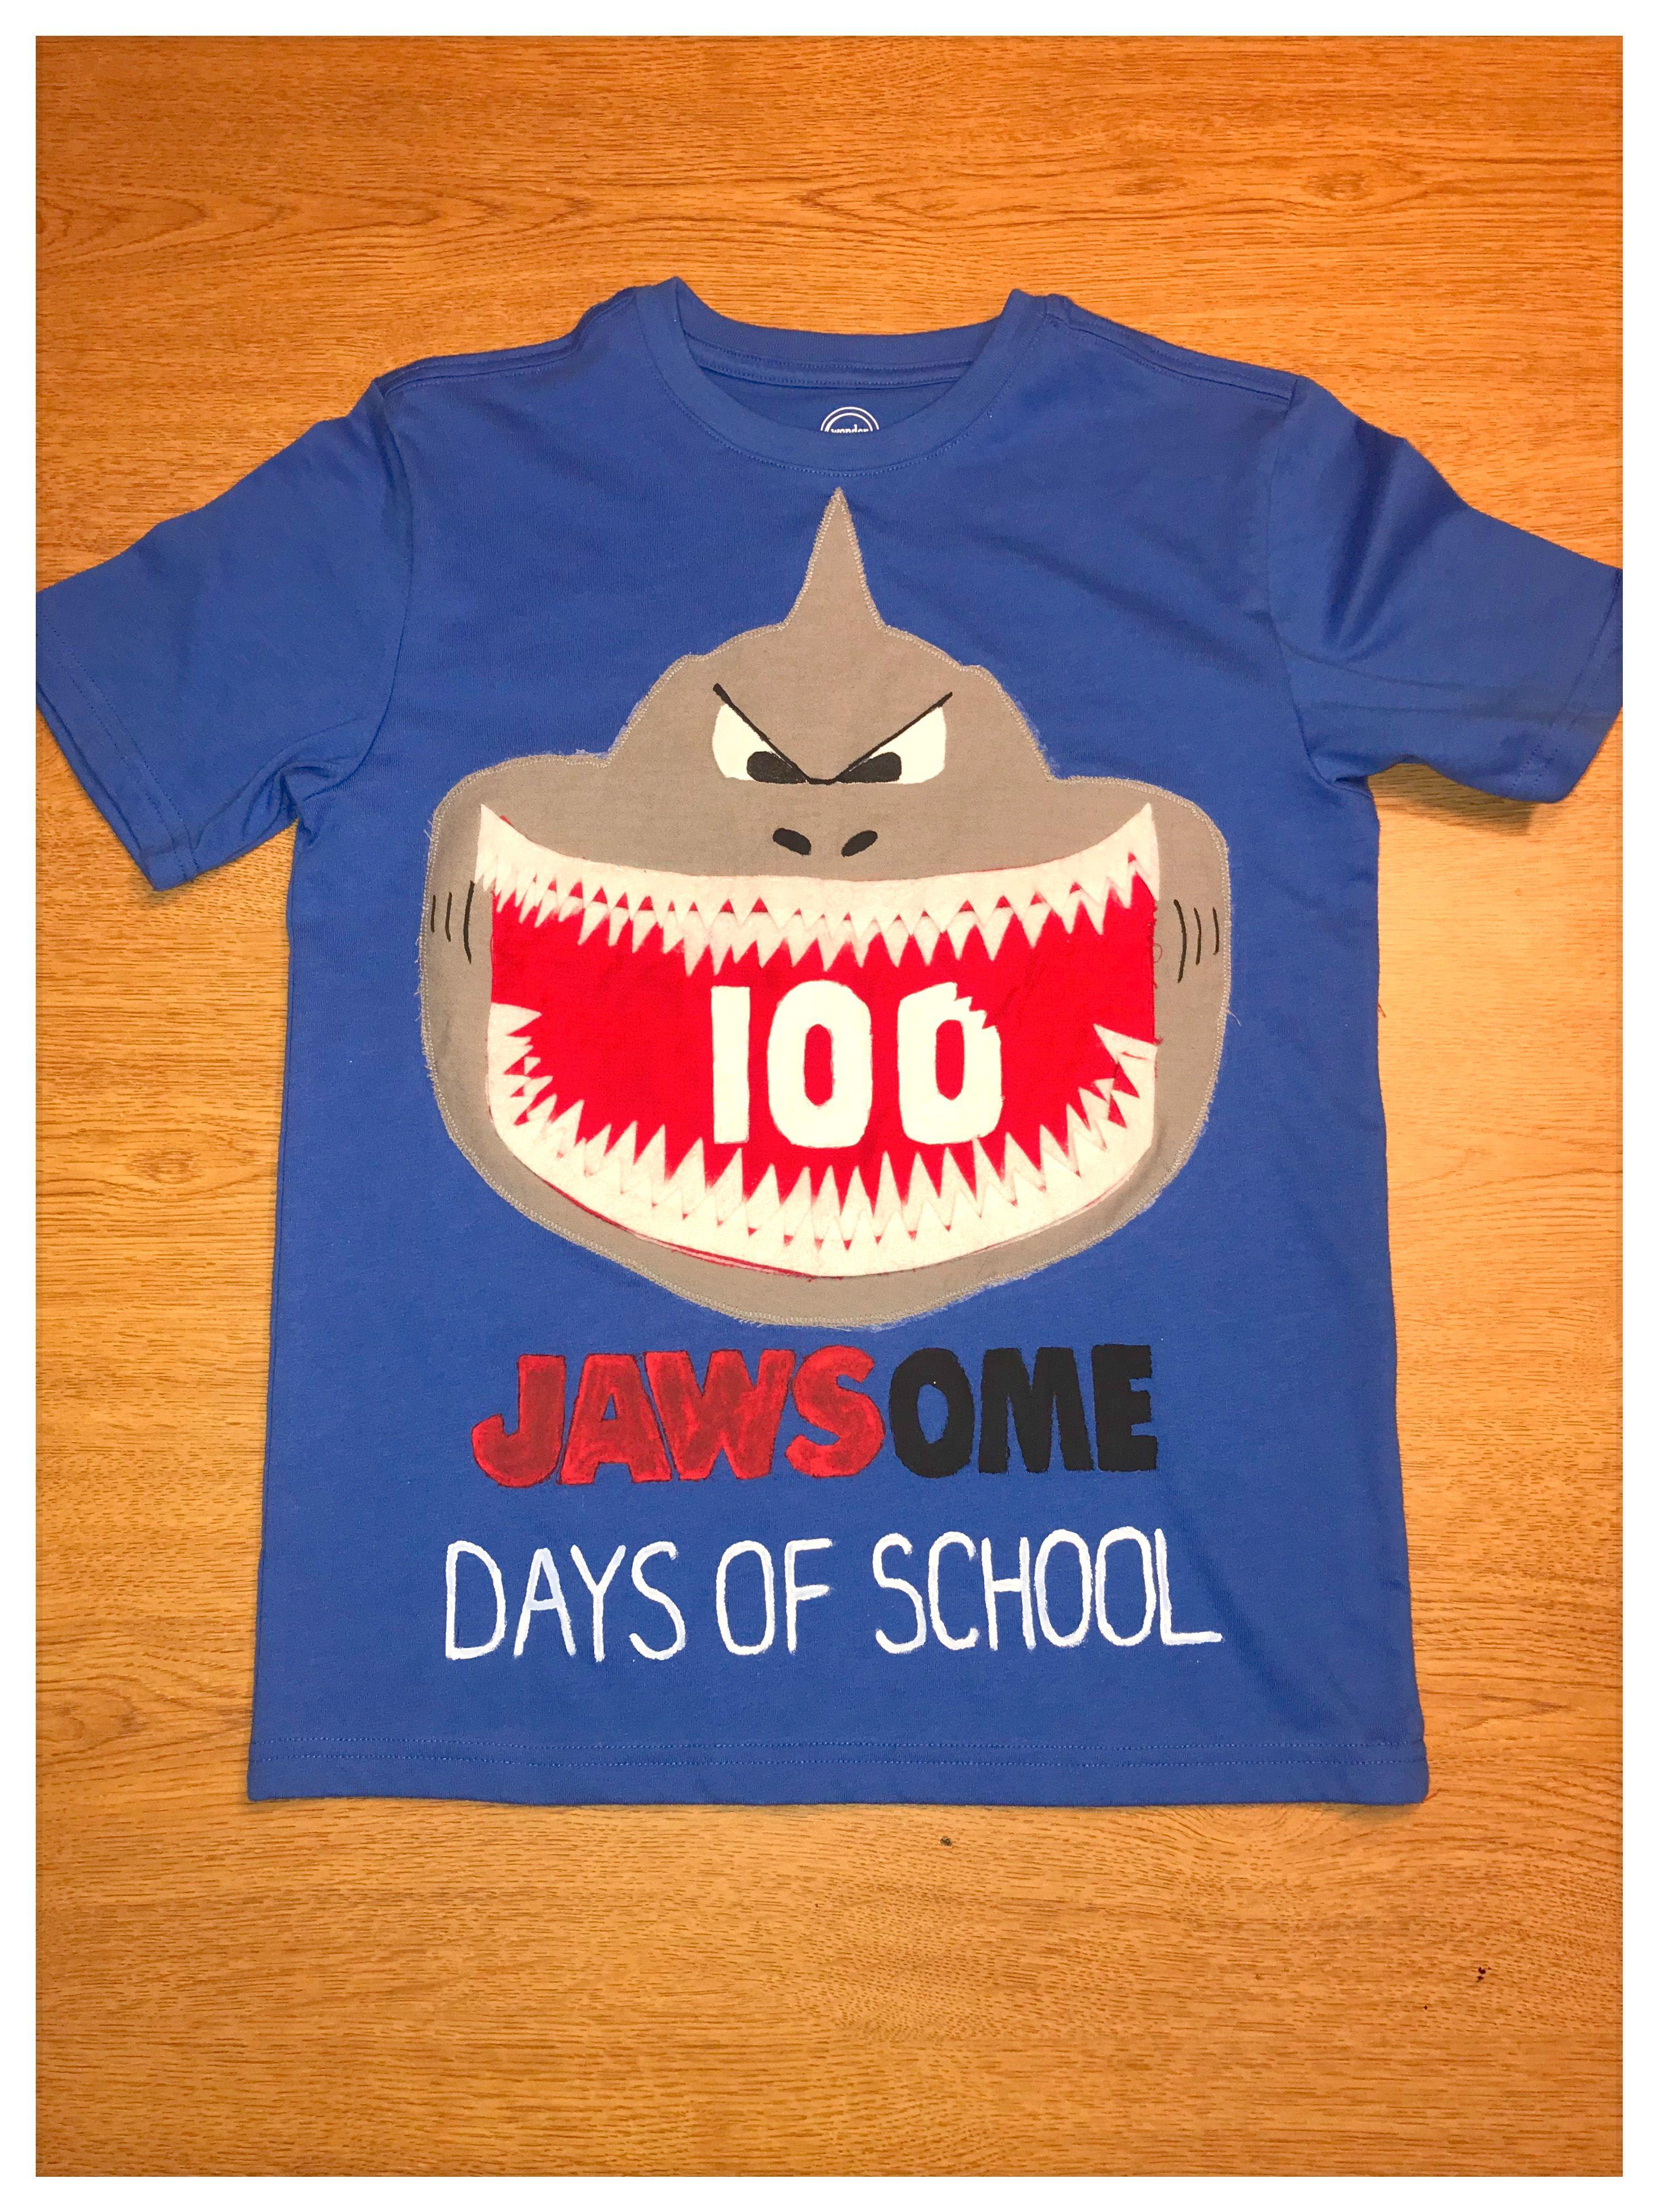 100 Jawsome Days Of School Shark Shirt 100 Day Shirt Ideas 100